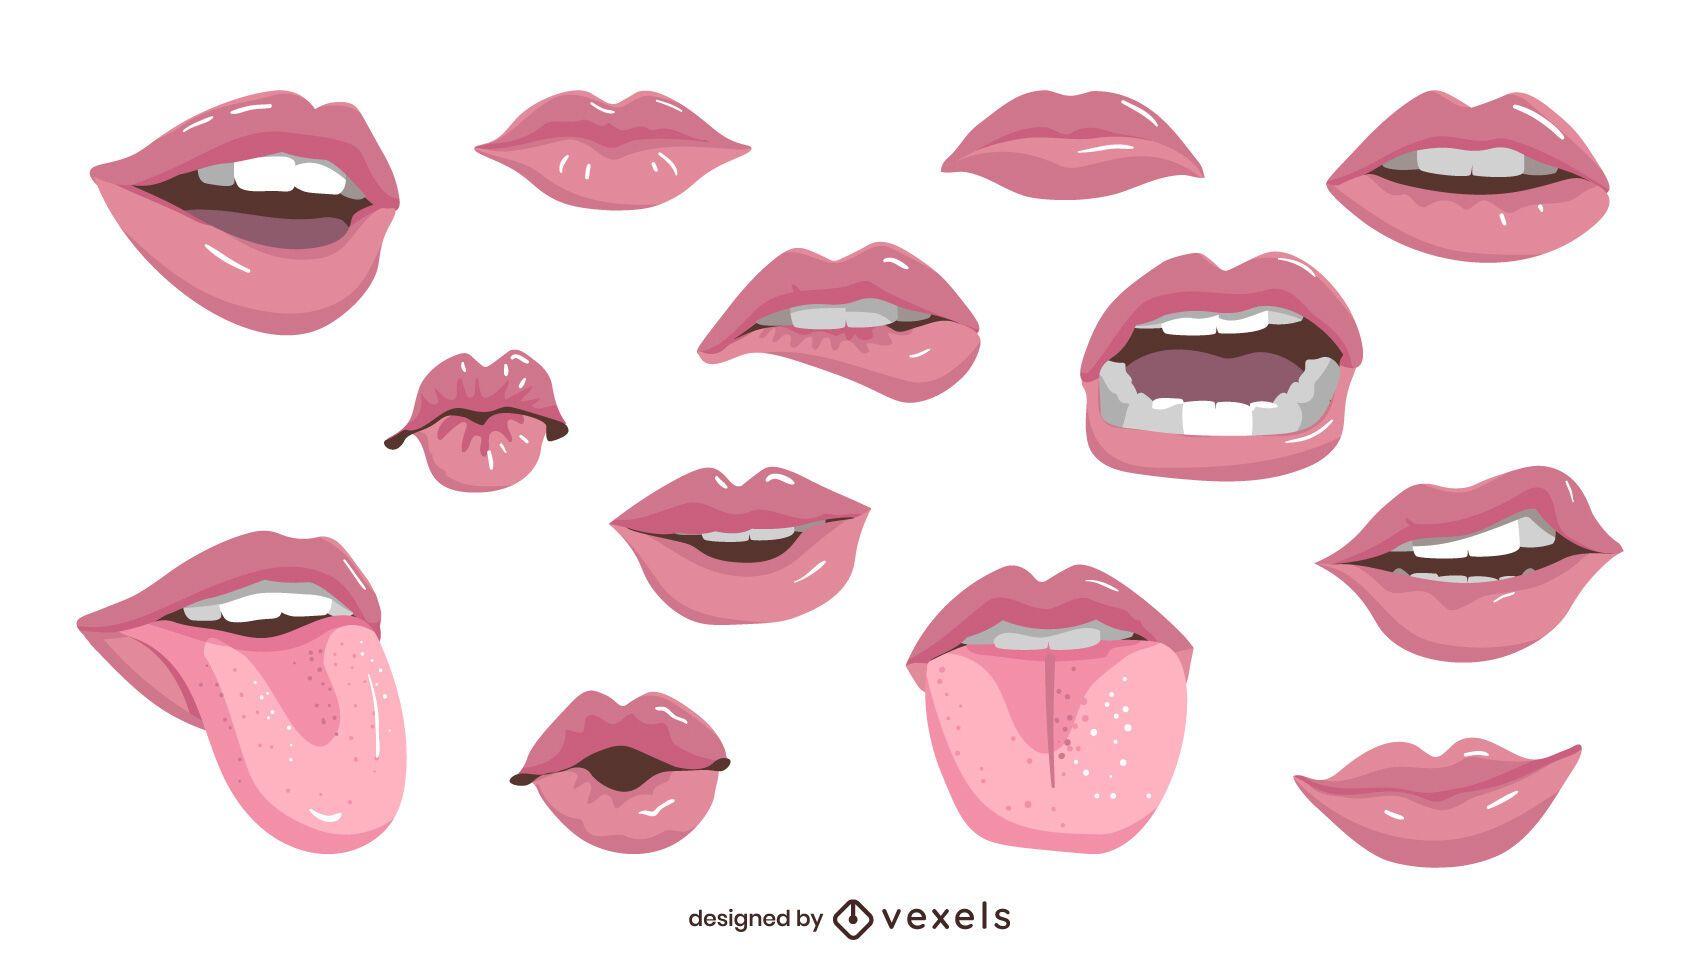 Glossy lips illustration set